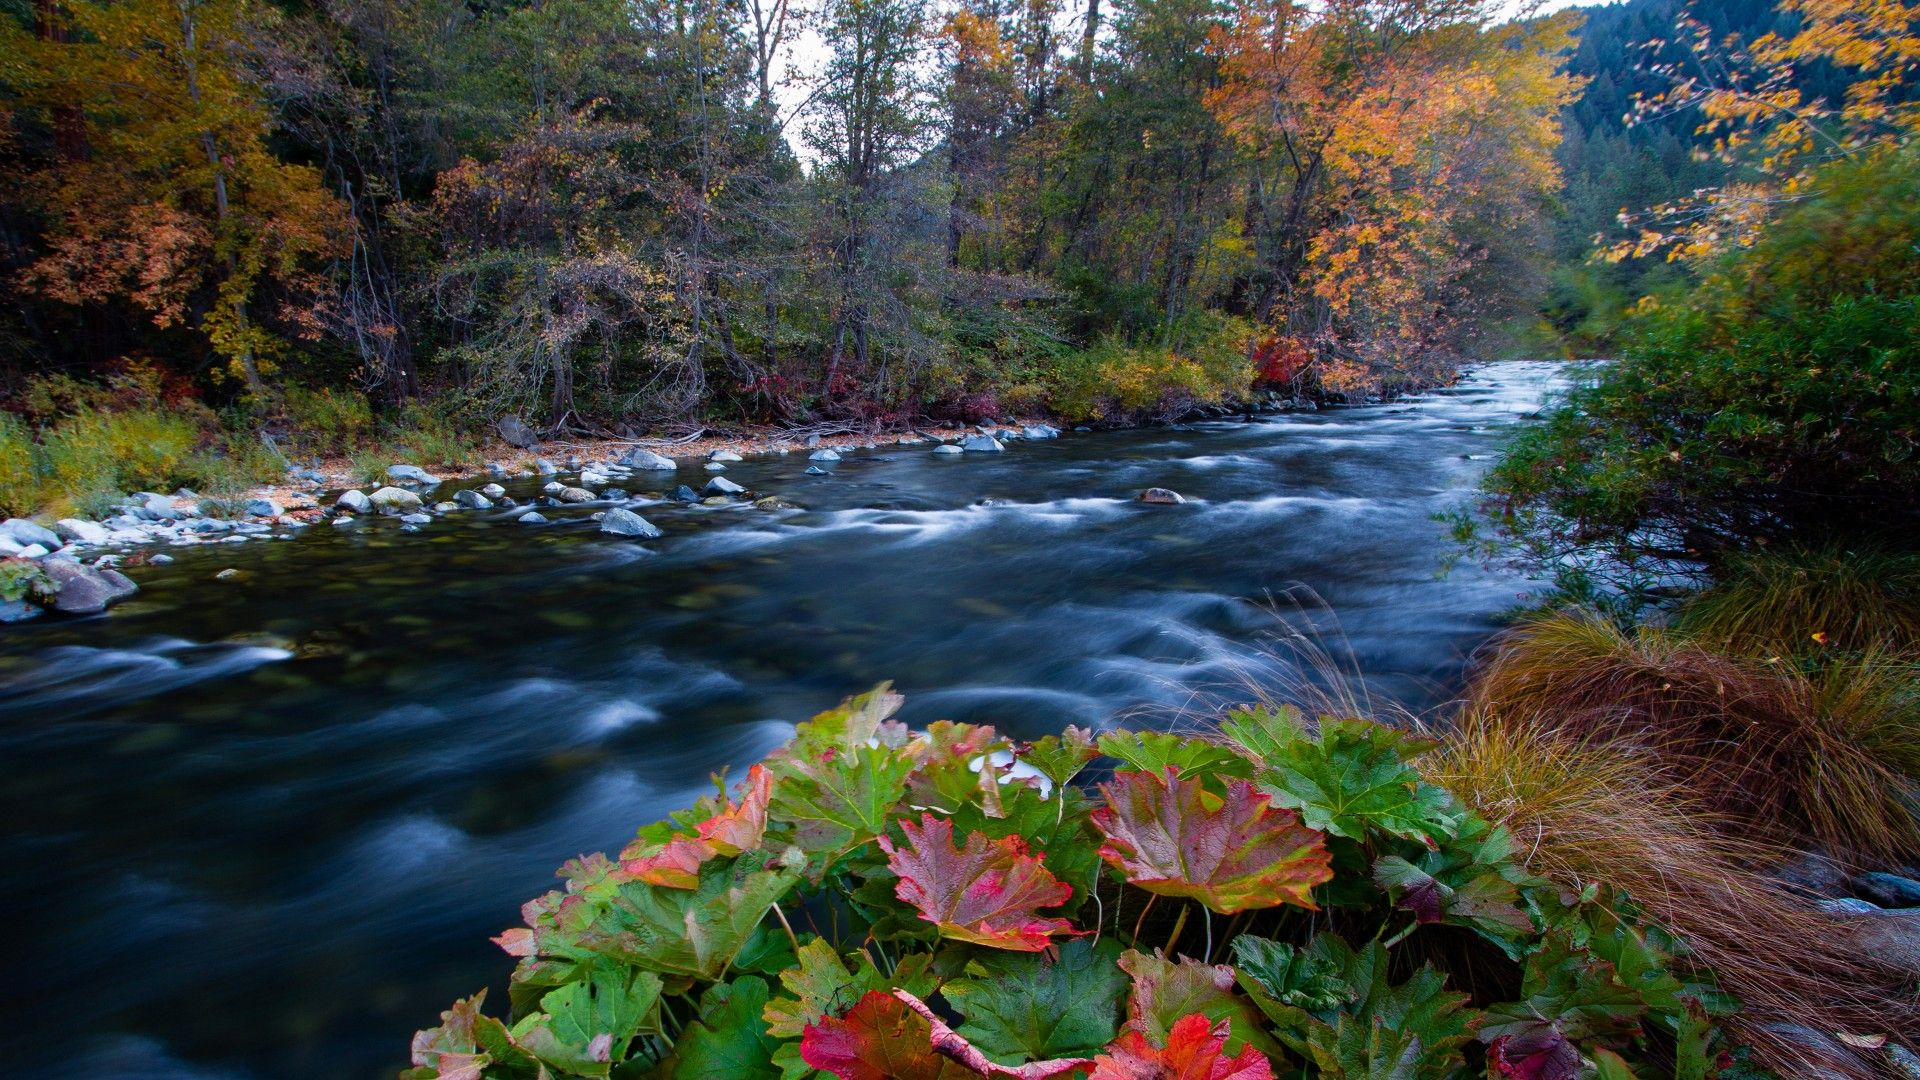 rivers forests autumn wallpaper [1920x1080]   Reddit HD Wallpapers   Autumn wallpaper hd ...